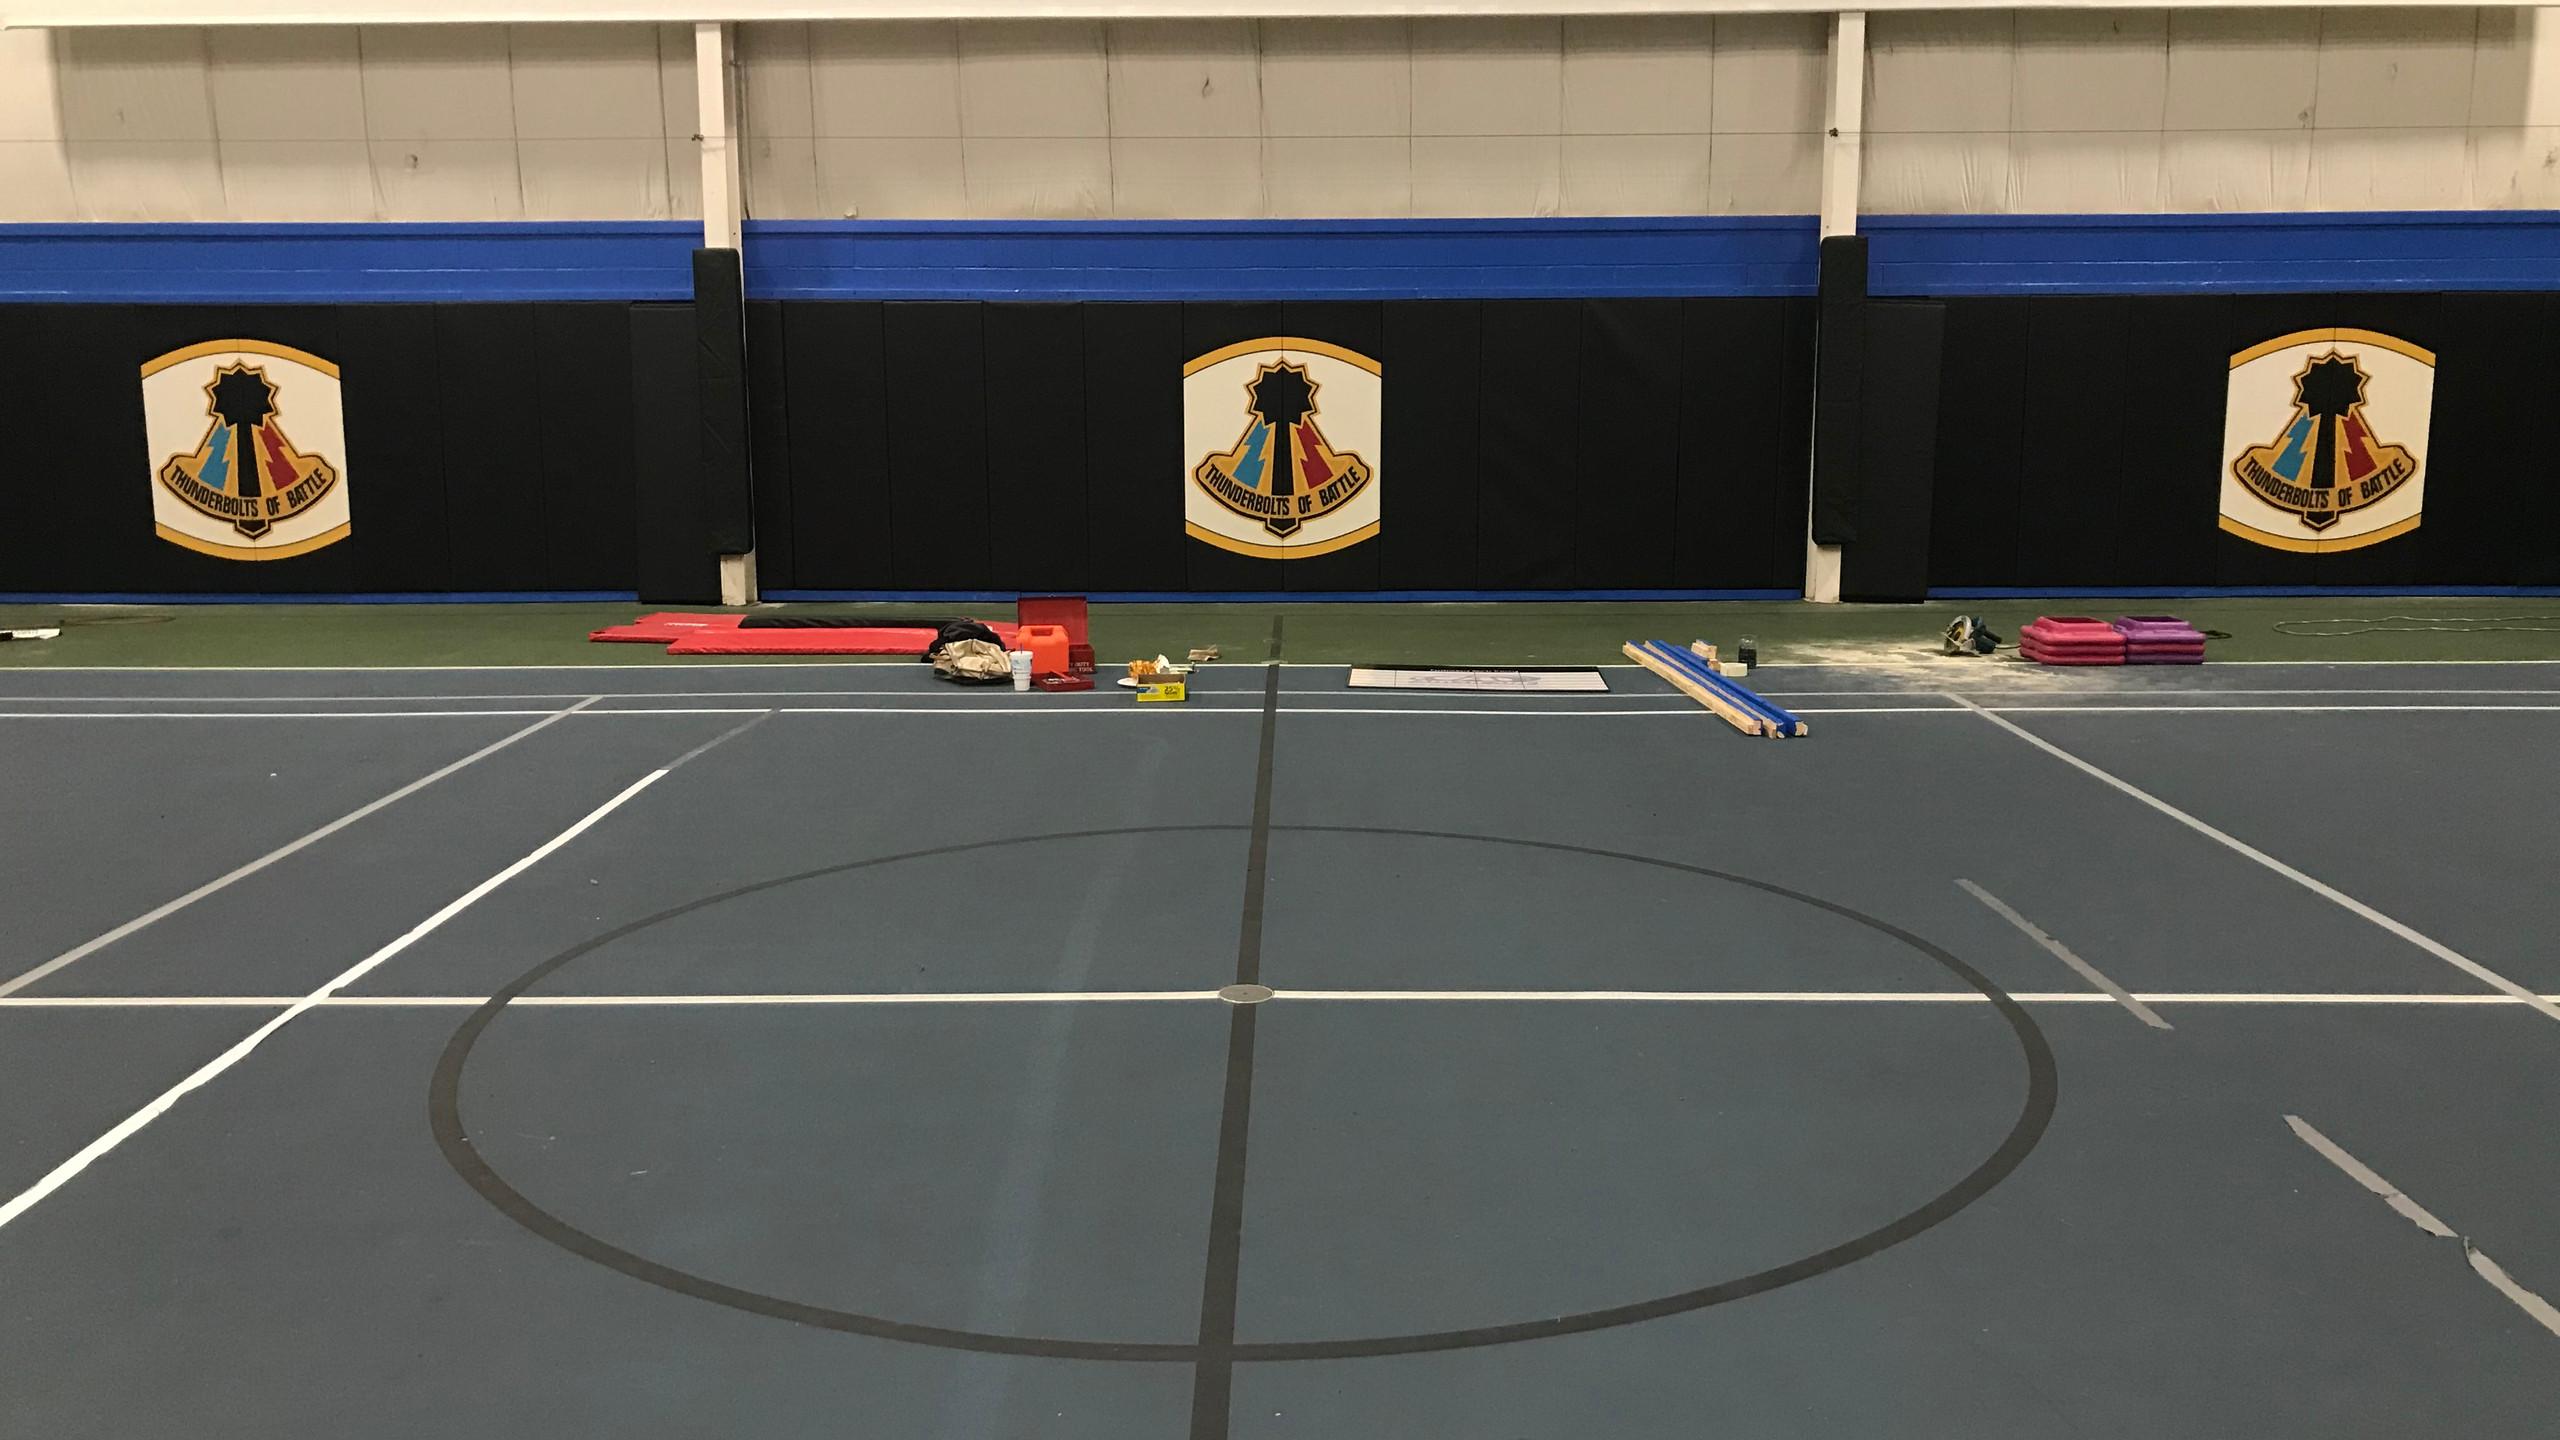 Final wall padding installed